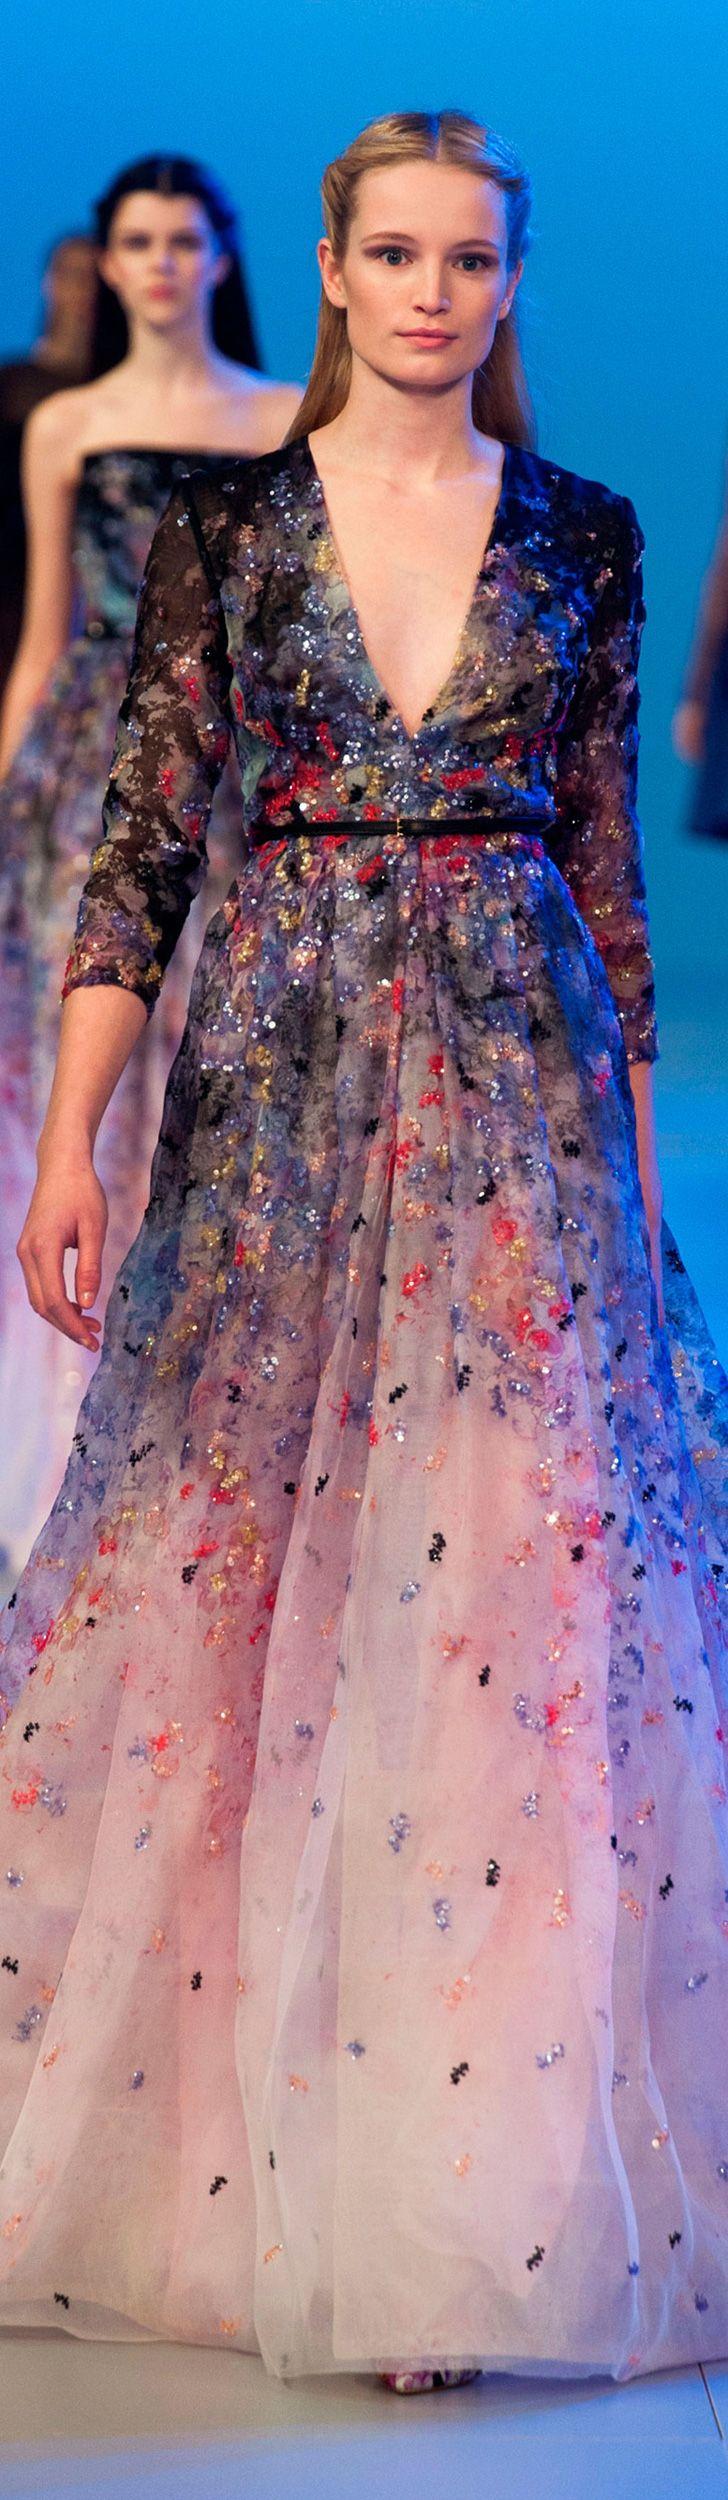 193 best babyyeehh images on Pinterest | Clothing apparel, Feminine ...